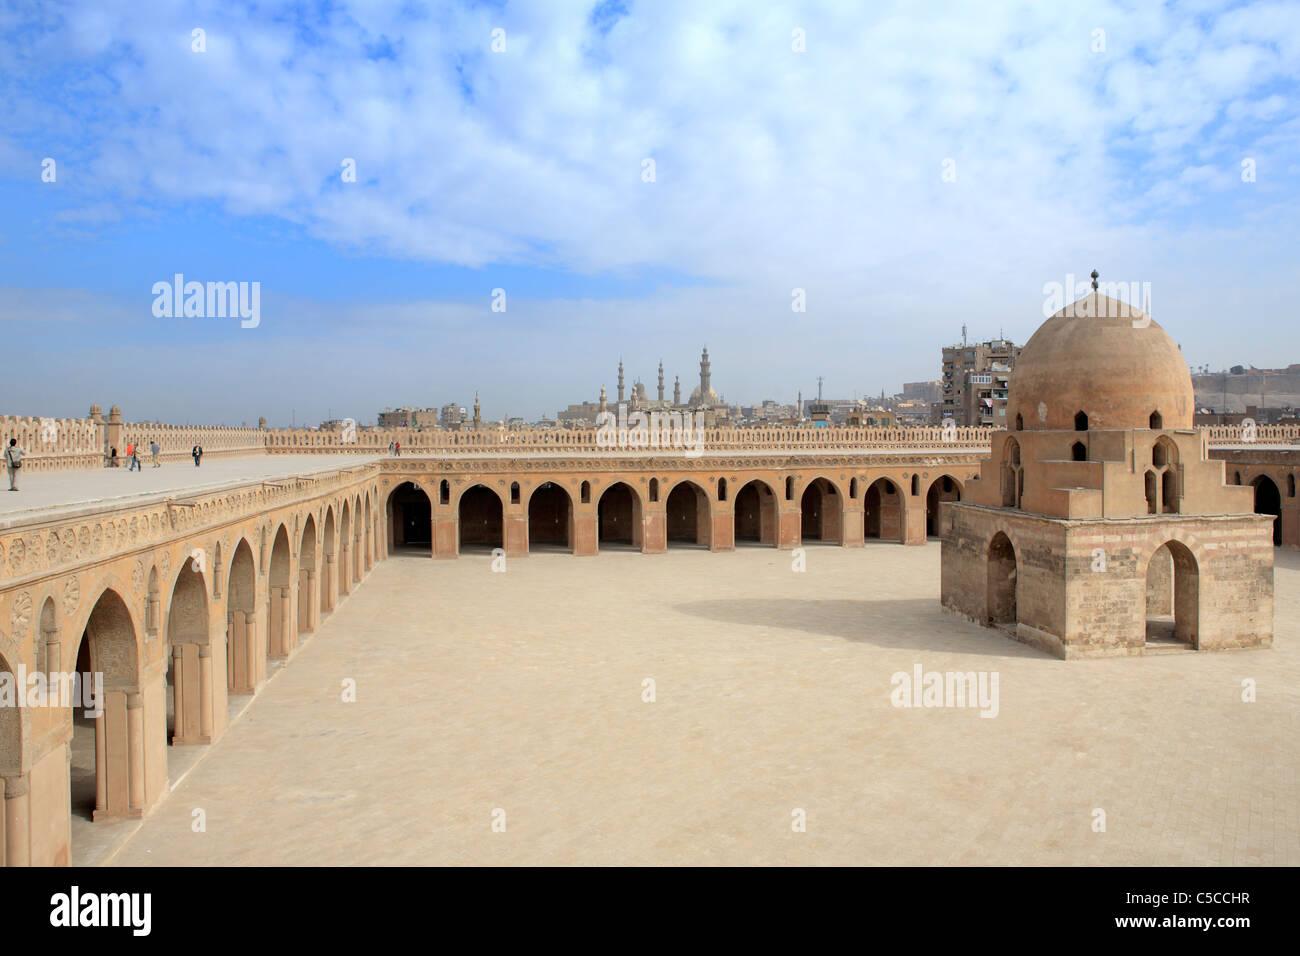 Ibn Tulun mosque (879), Cairo, Egypt - Stock Image